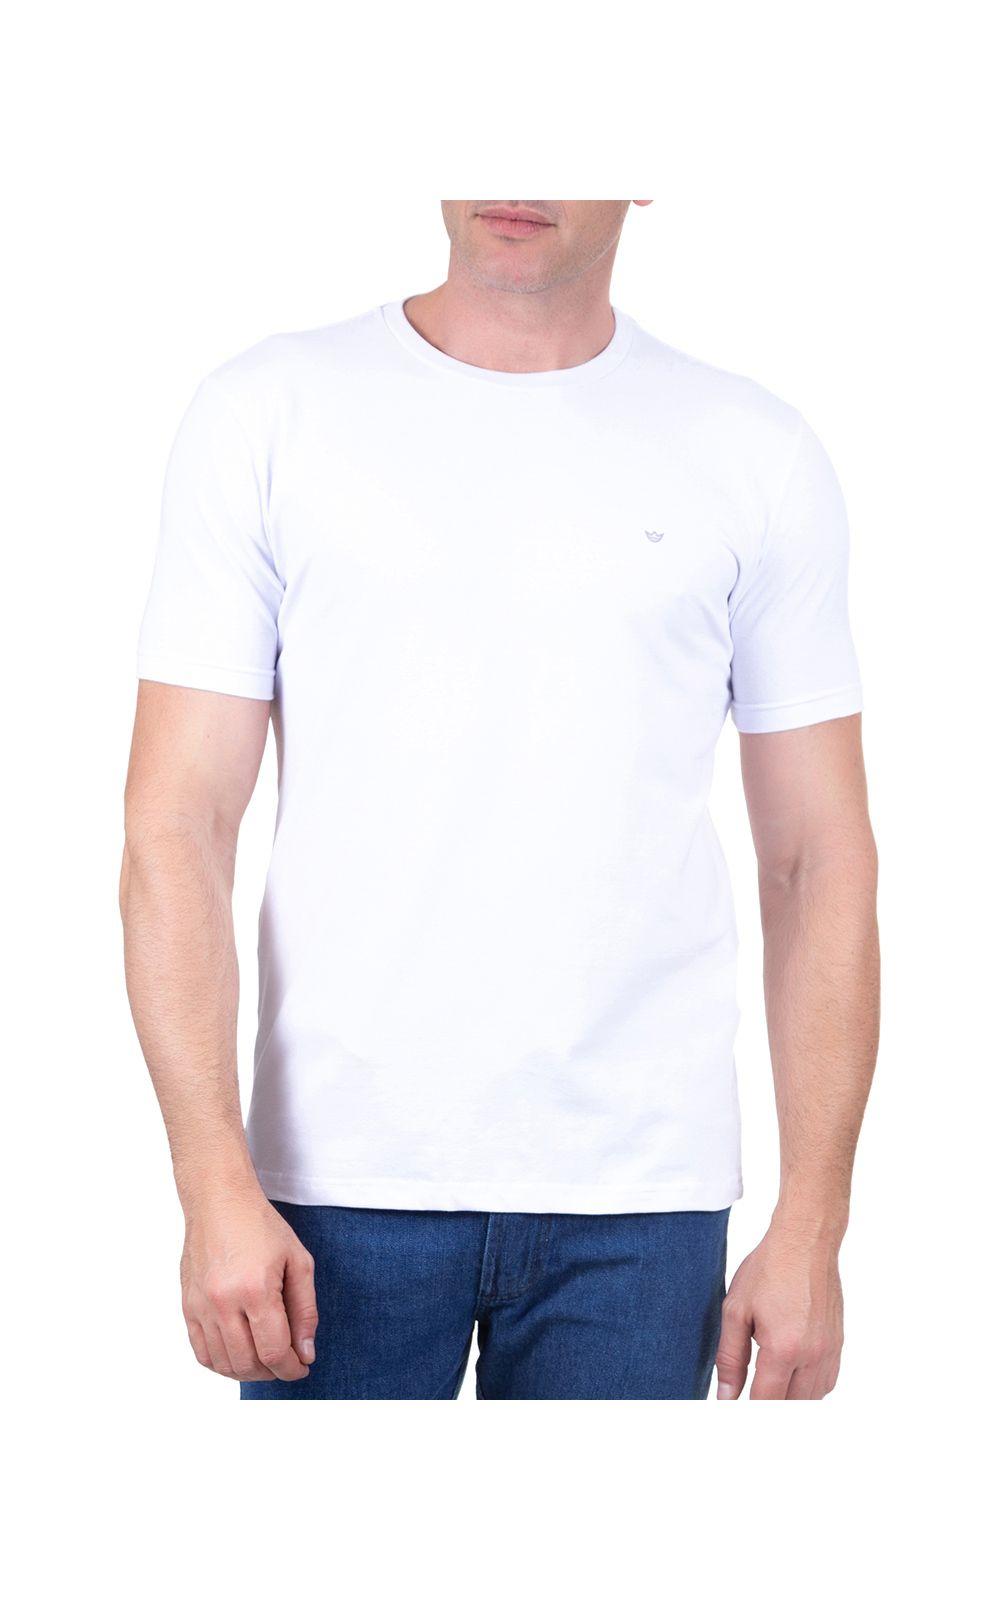 Foto 1 - Camiseta Masculina Branca Lisa